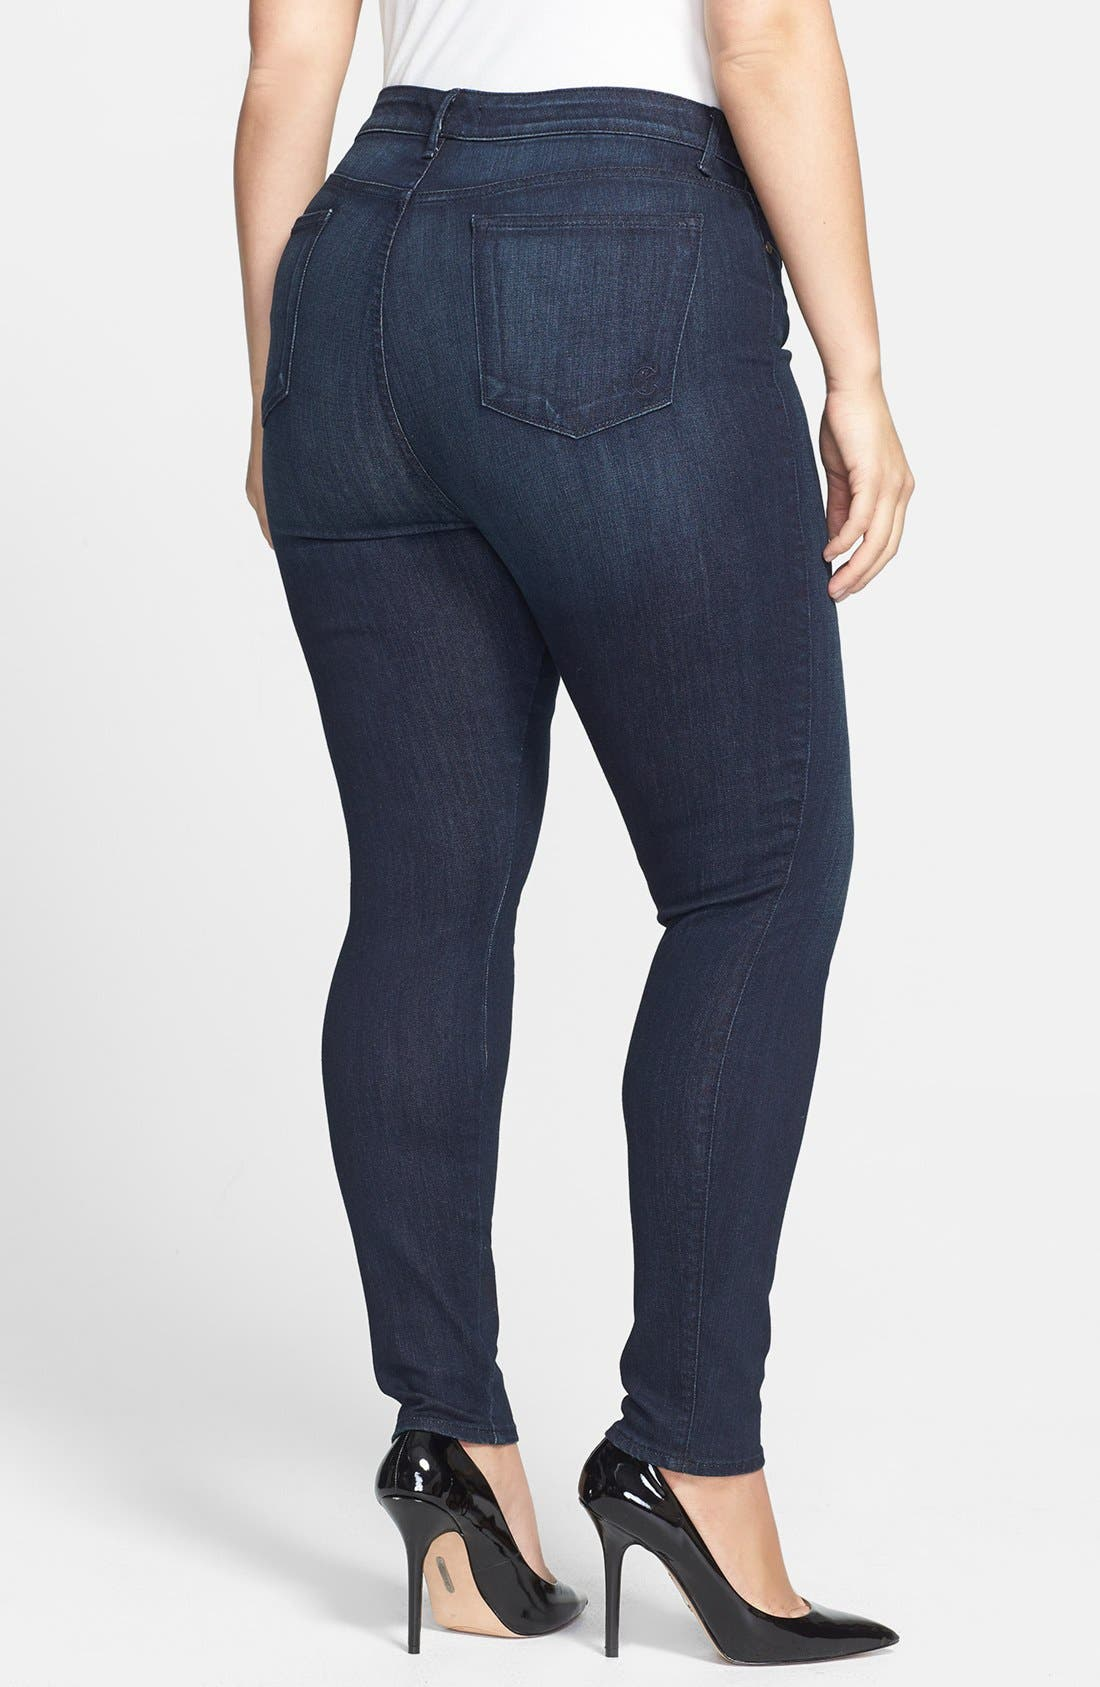 'Joy' Legging Style Stretch Jeans,                             Alternate thumbnail 3, color,                             400